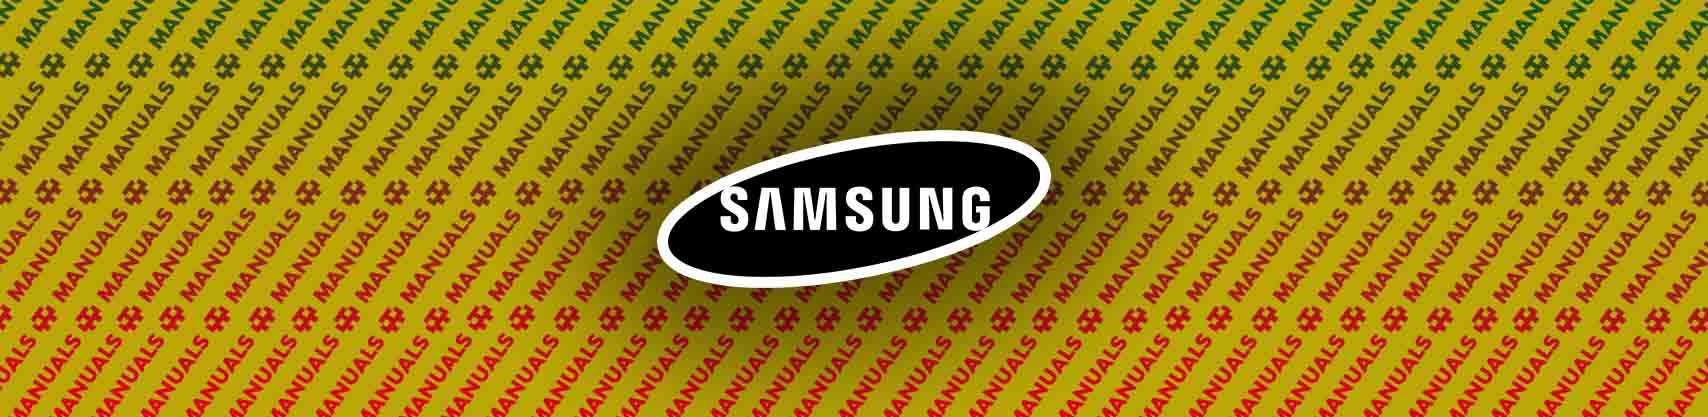 Samsung HMX-F90 Manual